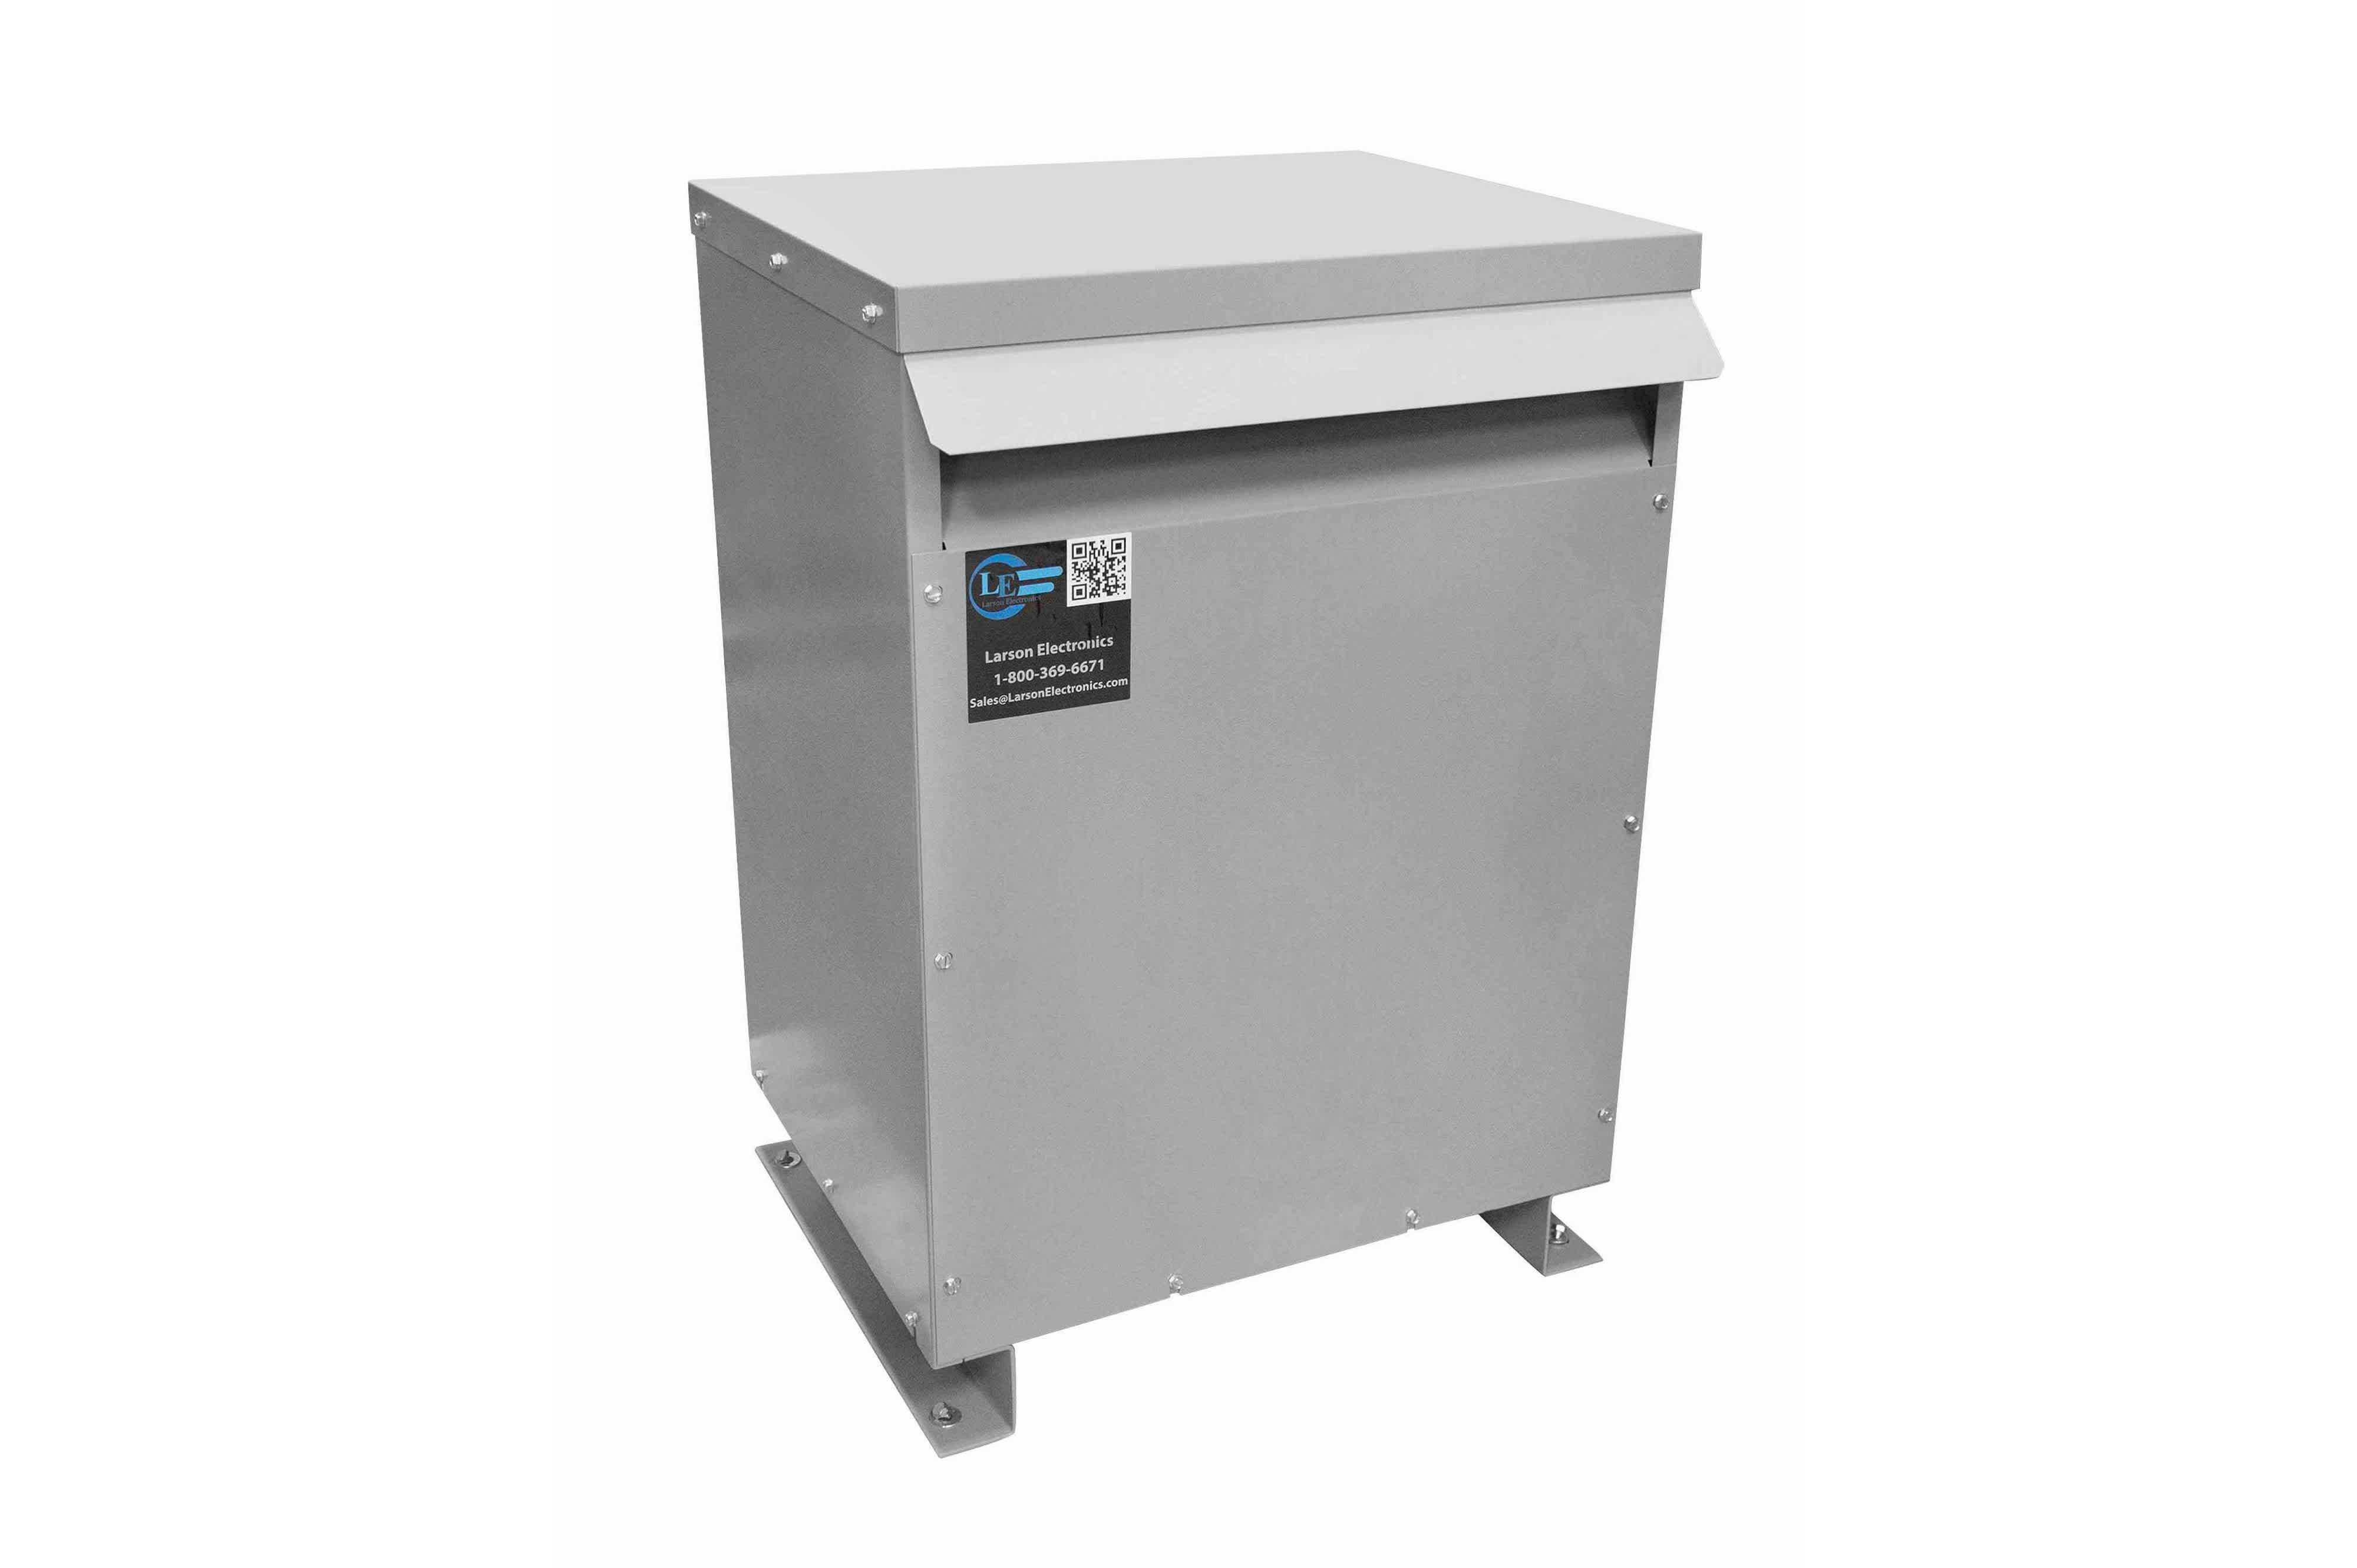 90 kVA 3PH Isolation Transformer, 460V Wye Primary, 600V Delta Secondary, N3R, Ventilated, 60 Hz